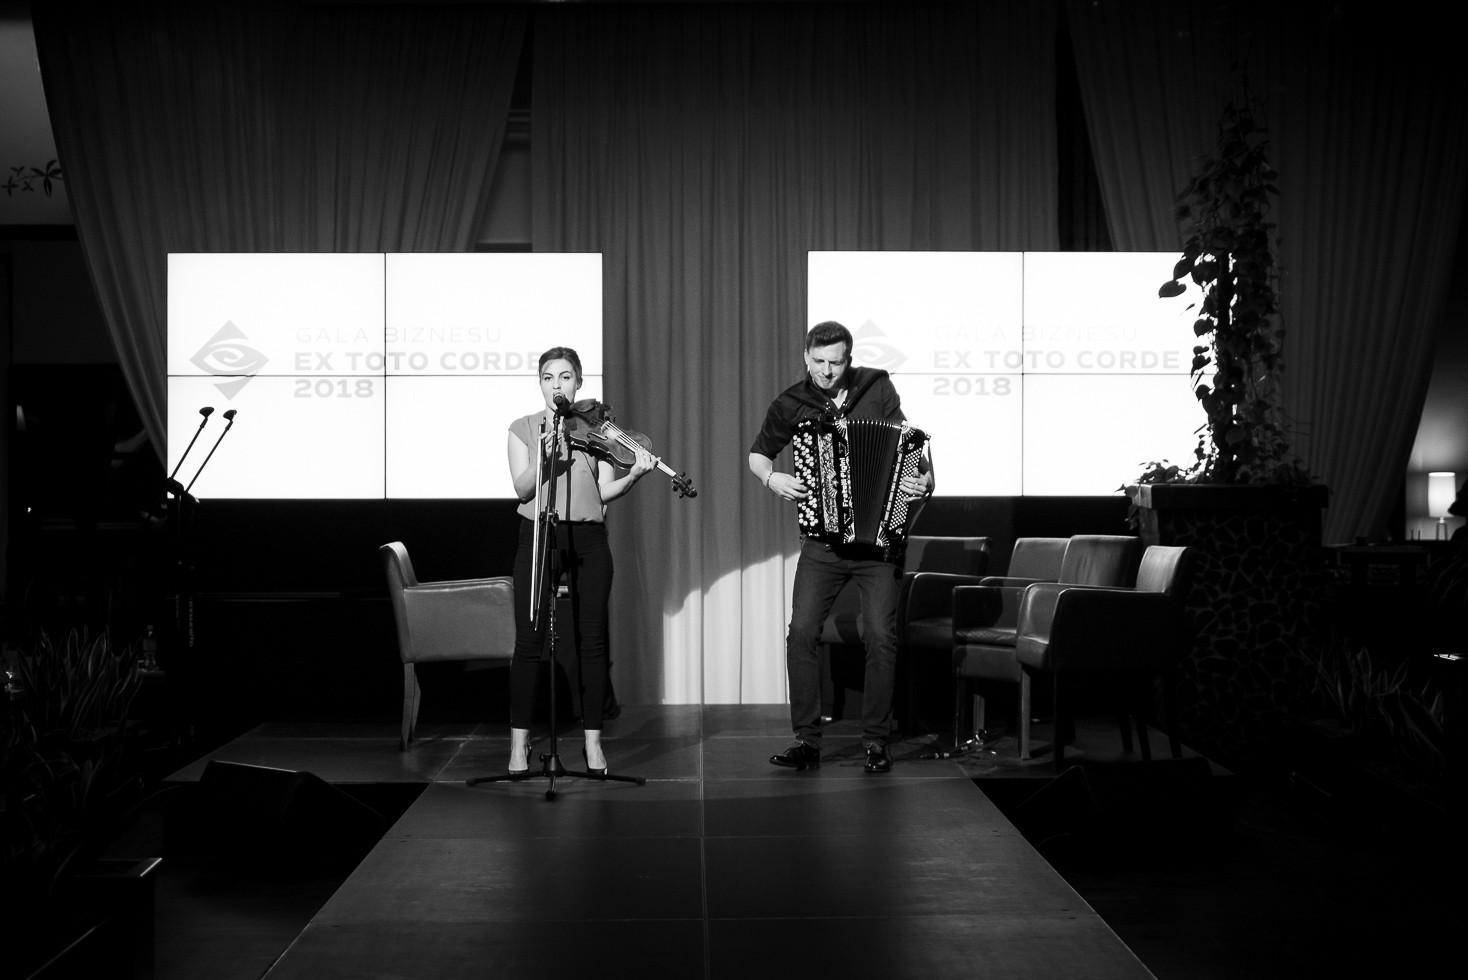 Gala Ex Toto Corde- fotografia Eventowa-